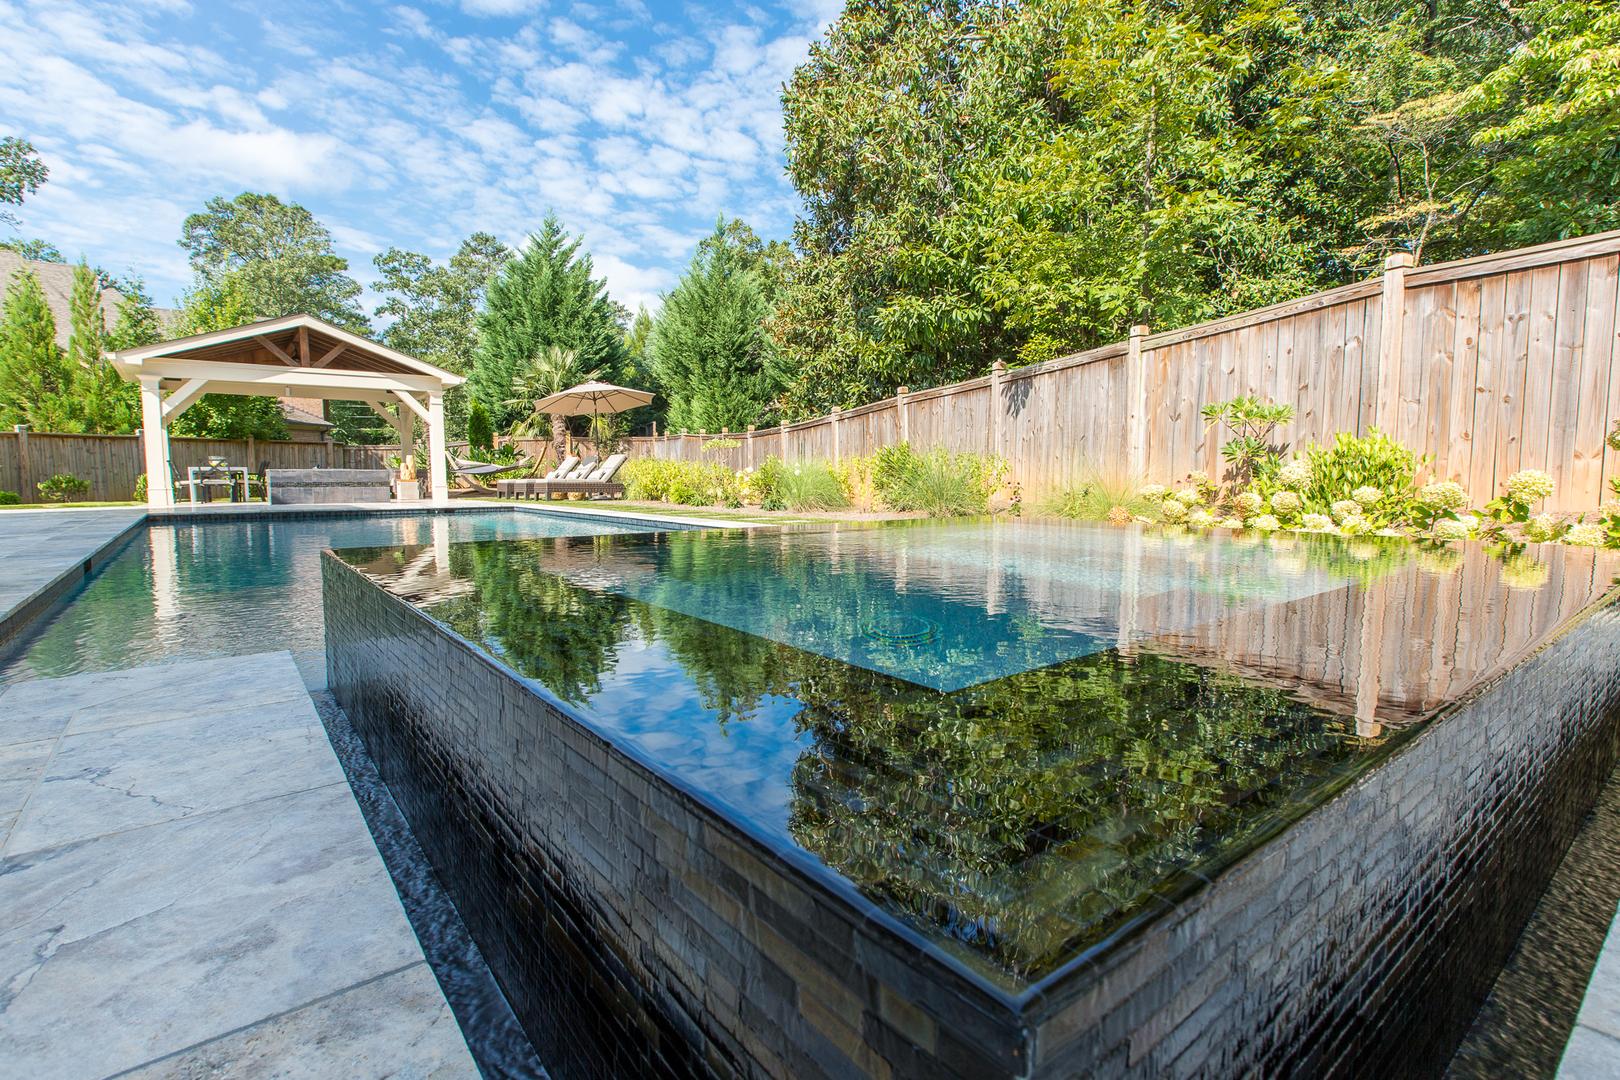 Atlantis Pools & Spas, Llc. - Swimming Pool Companies, Swimming Pool ...